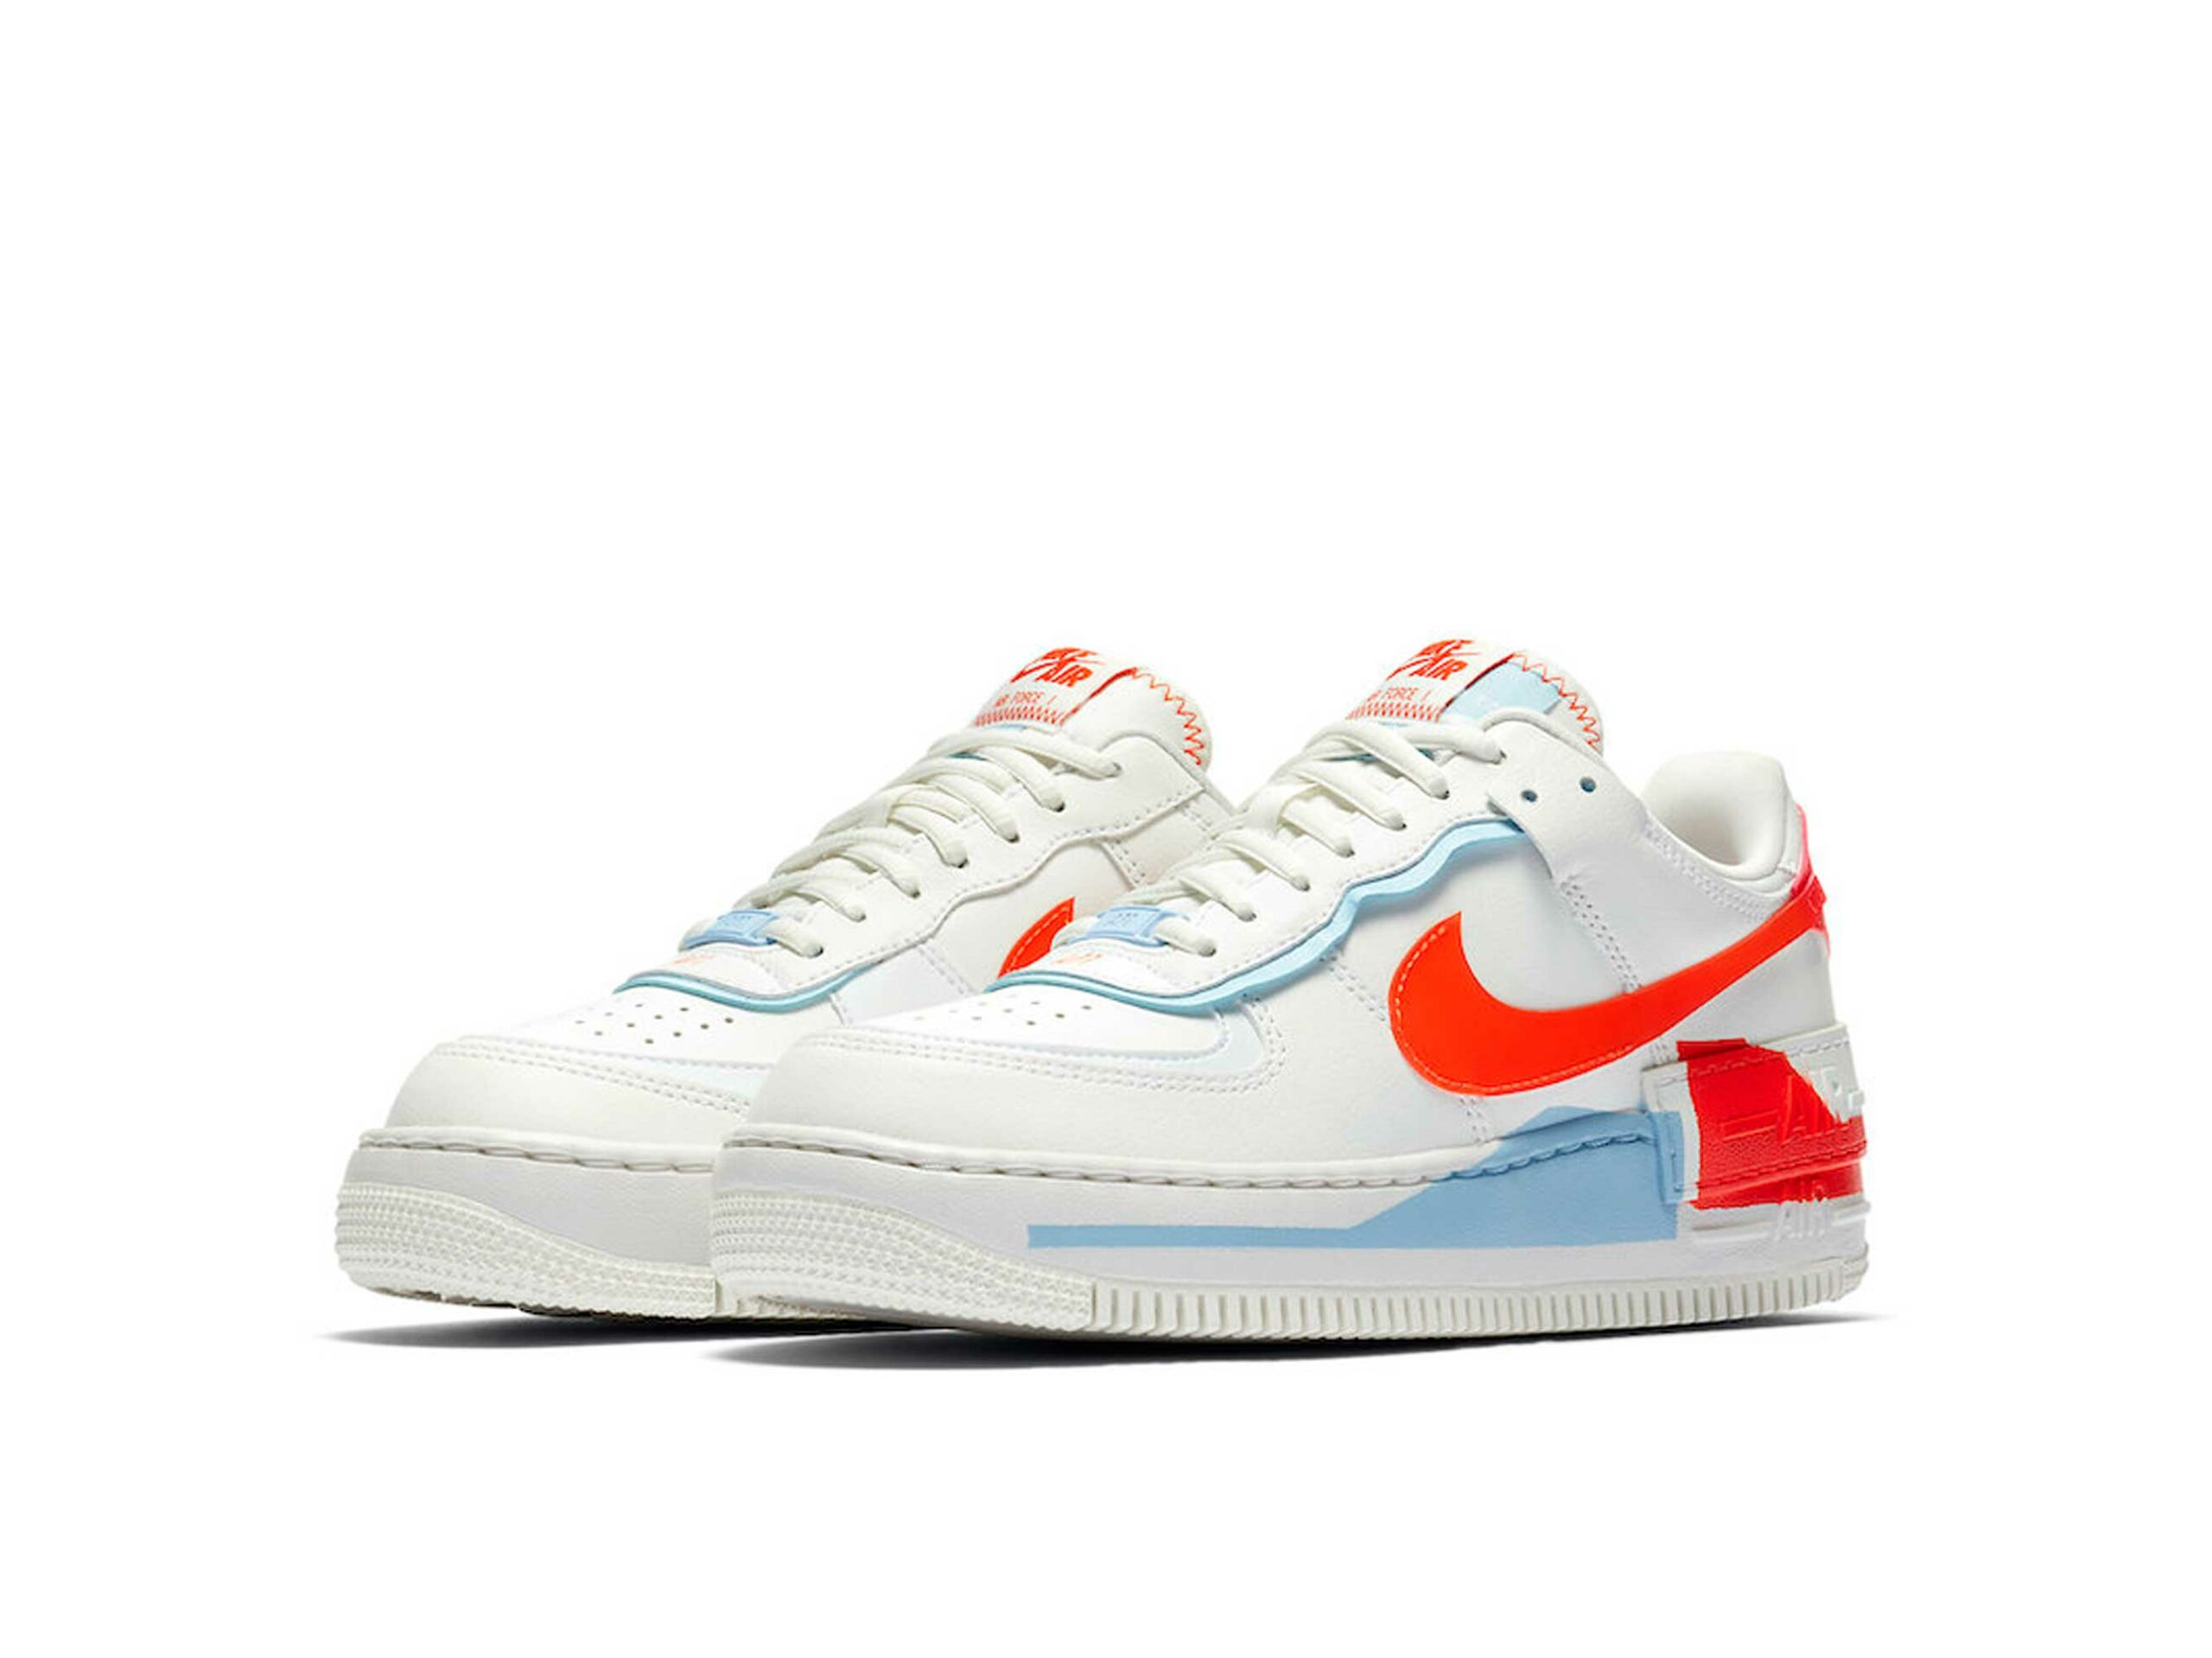 nike air force 1 shadow summit white orange cq9503_100 купить